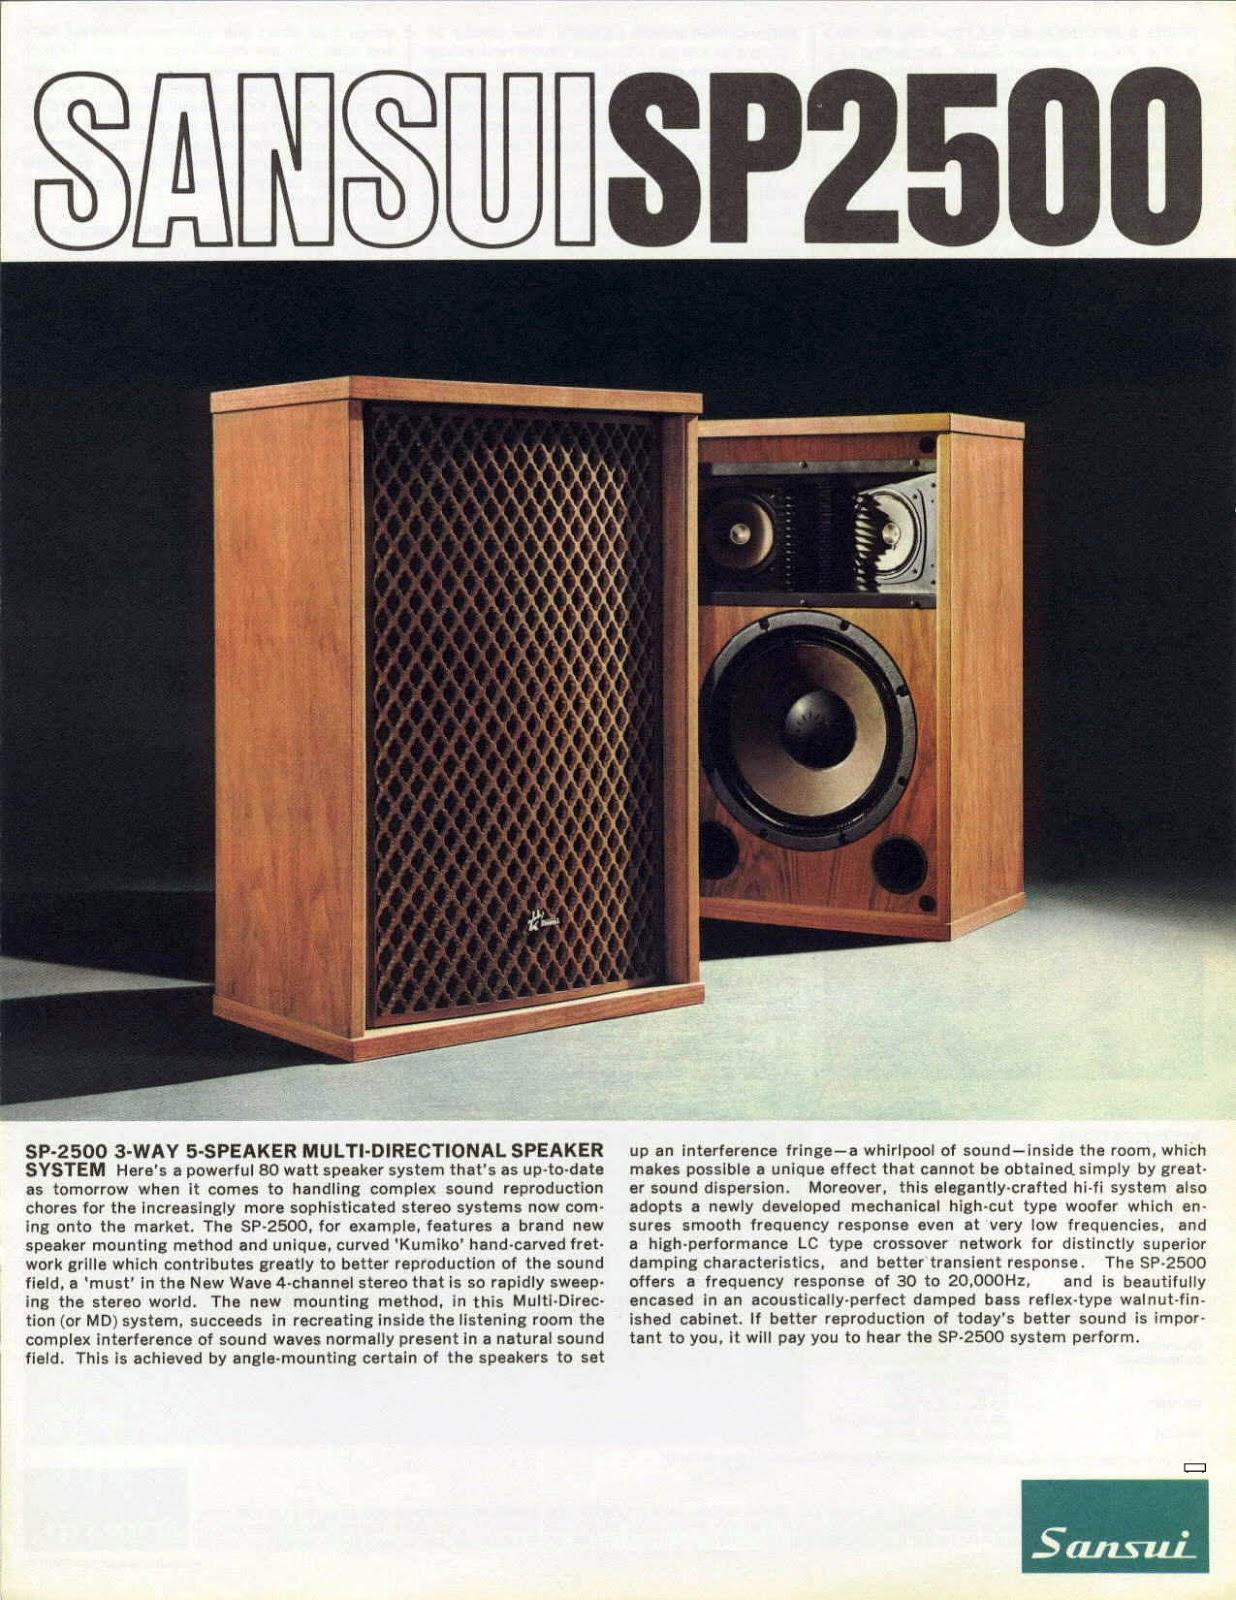 Golden Age Of Audio Sansui Sp 2500 Vintage Speakers